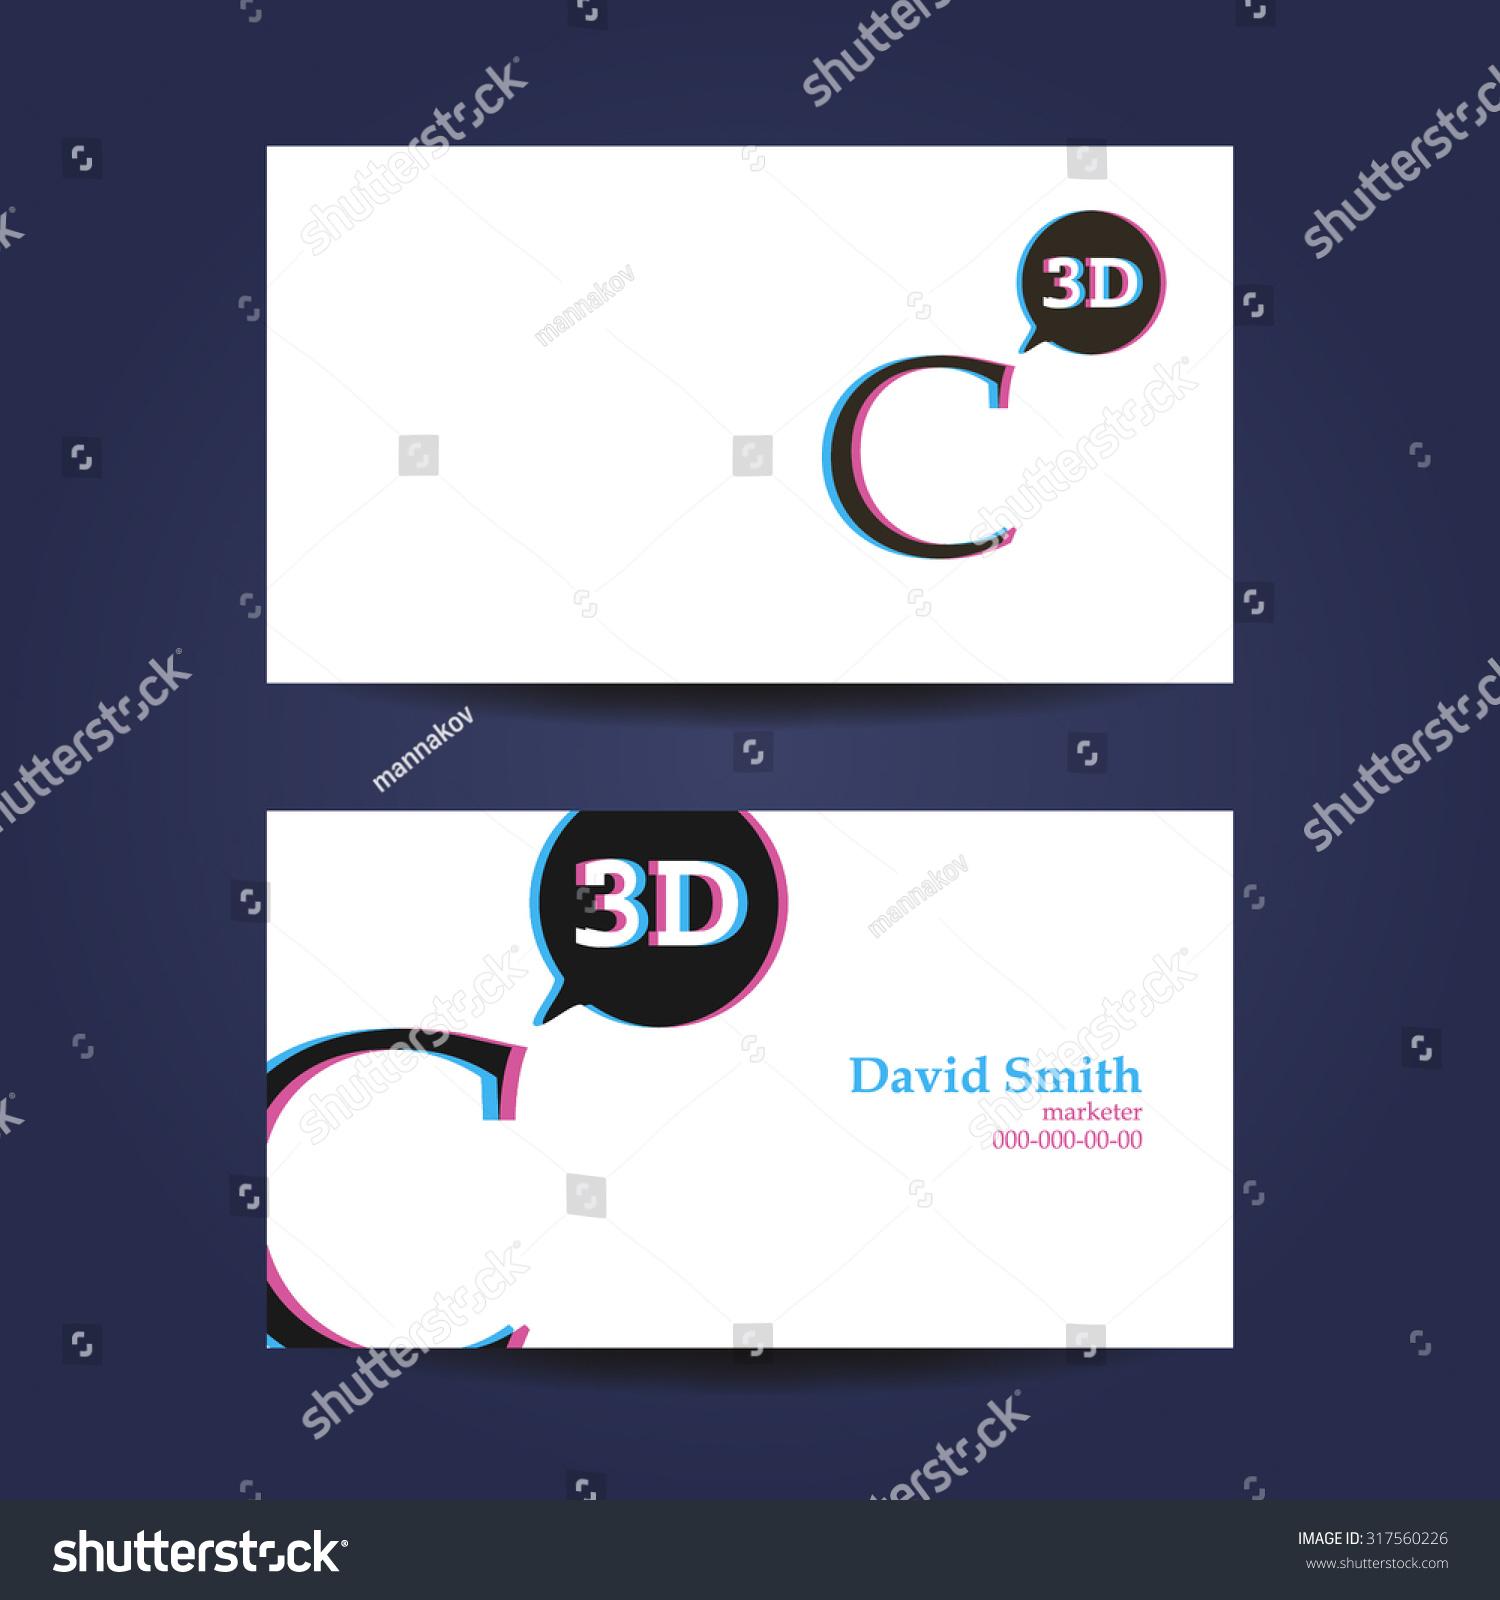 Business card template letter c 3 d stock vector 317560226 business card template letter c 3 d stock vector 317560226 shutterstock colourmoves